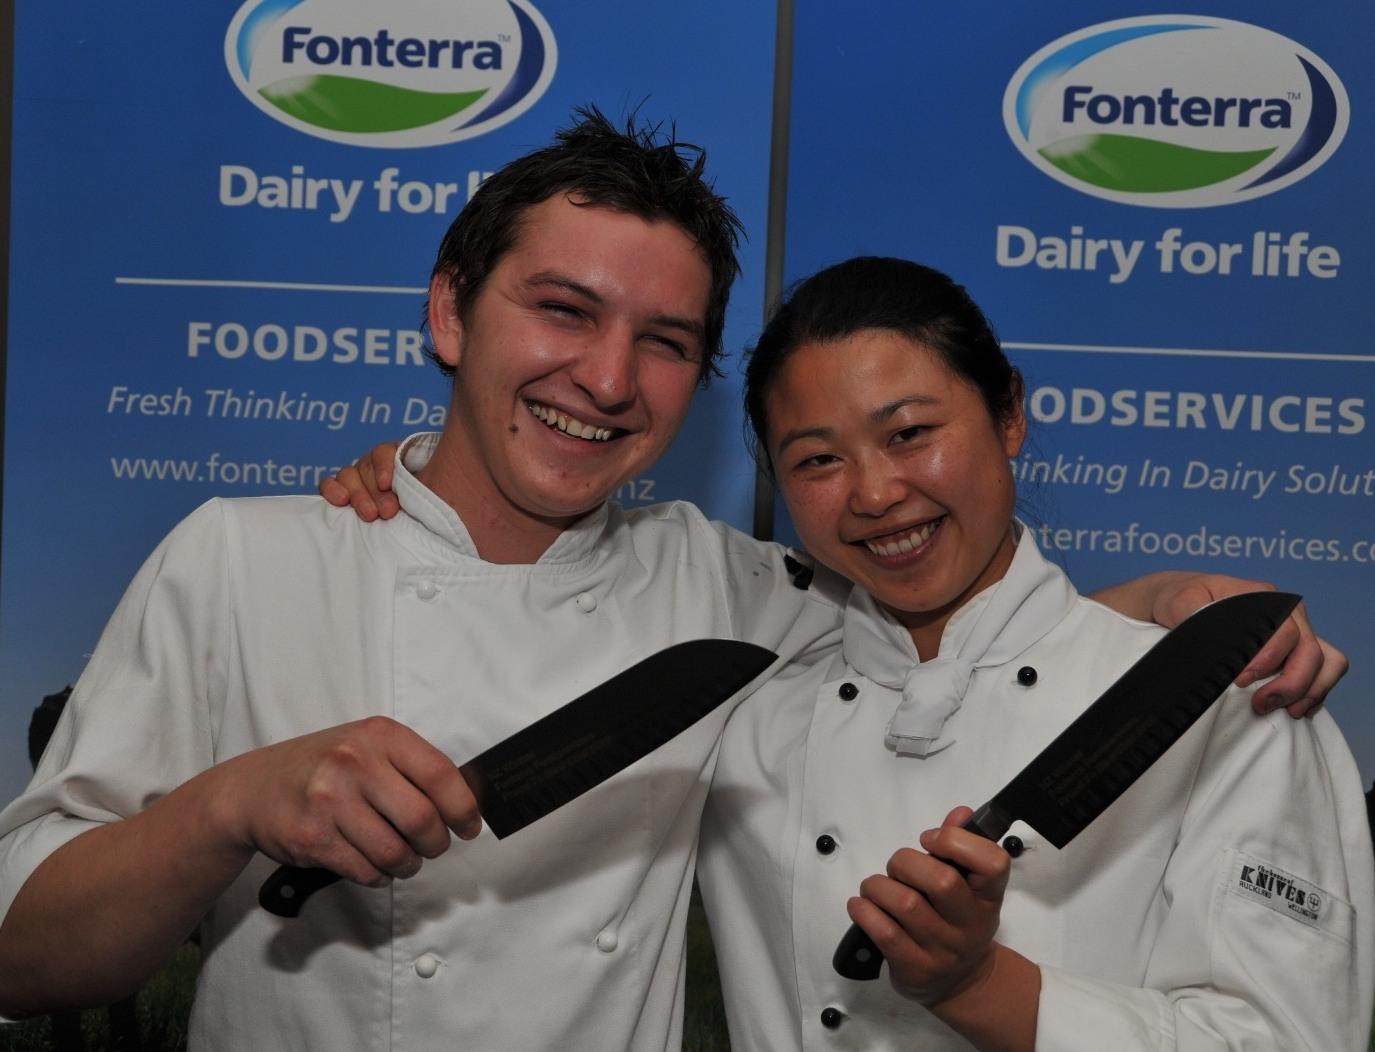 Two Award-winning kiwi chefs fresh ideas